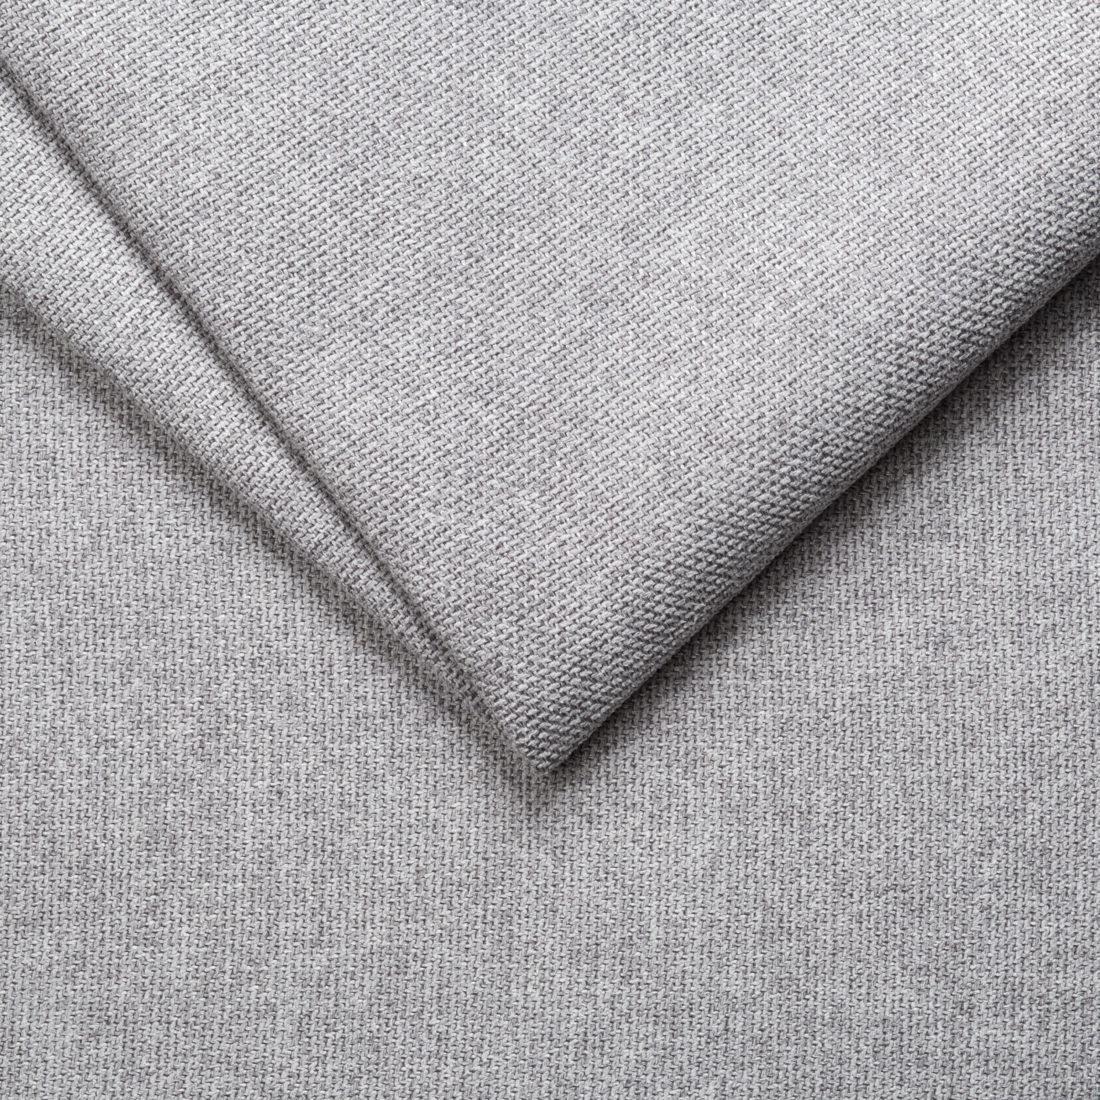 Меблева тканина Austin 18 Grey, рогожка